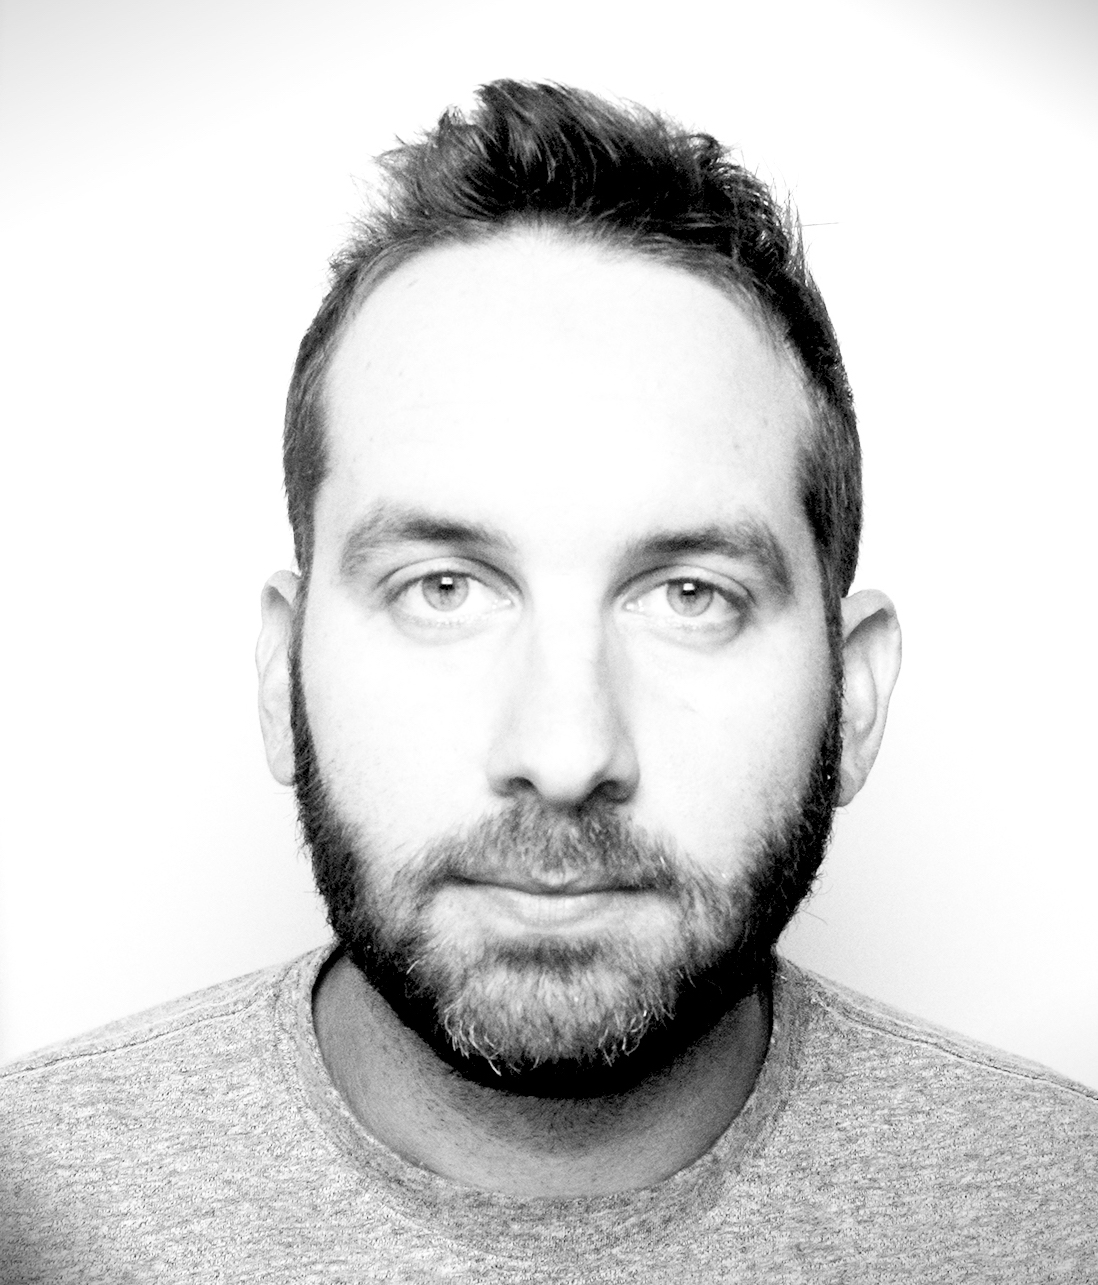 Jared Moskowitz